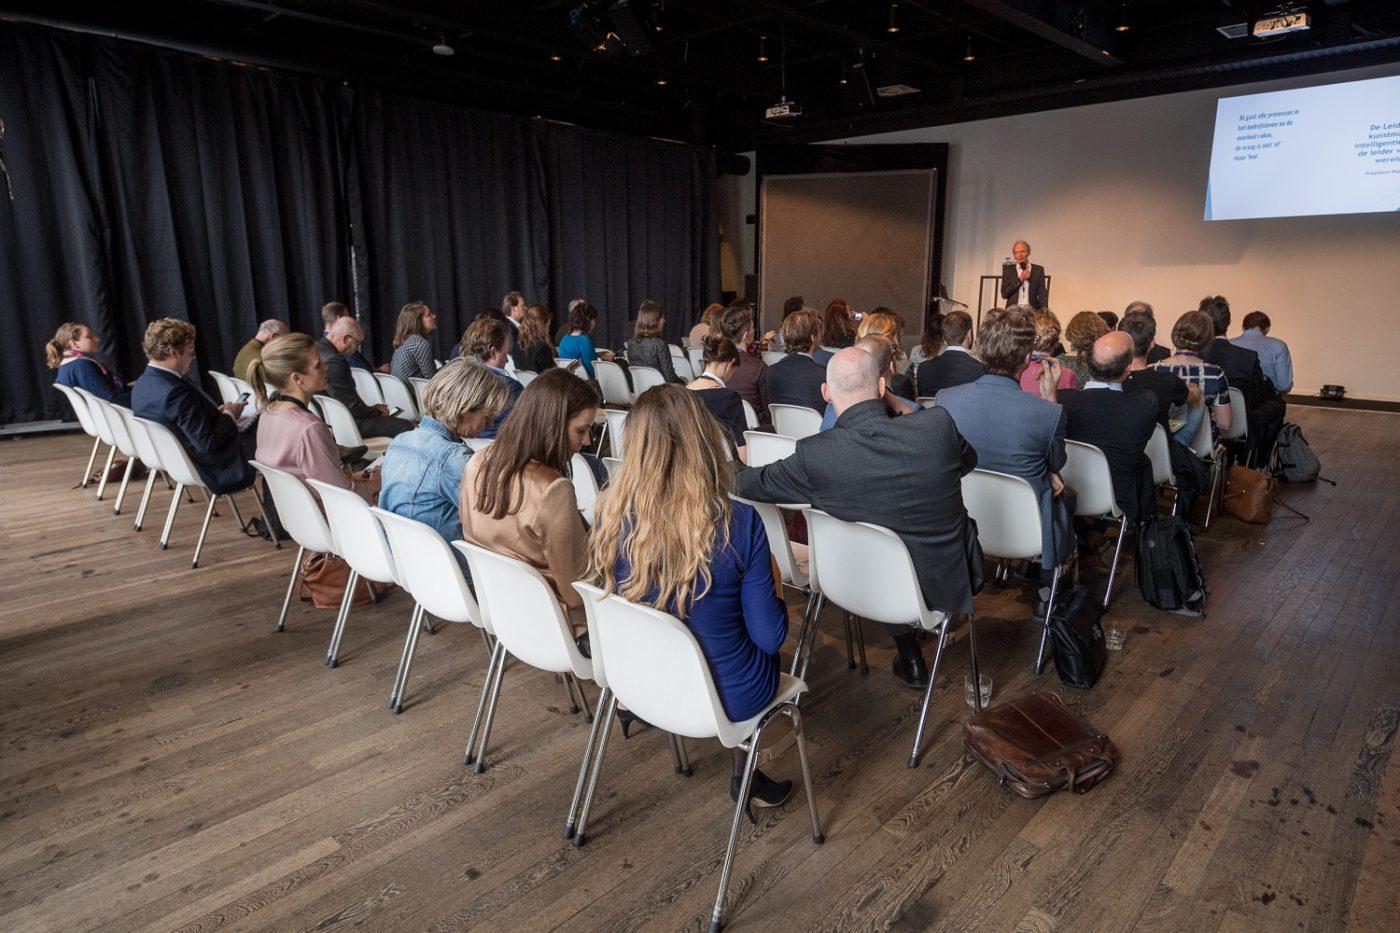 Plenaire sessie bij Cineac symposium